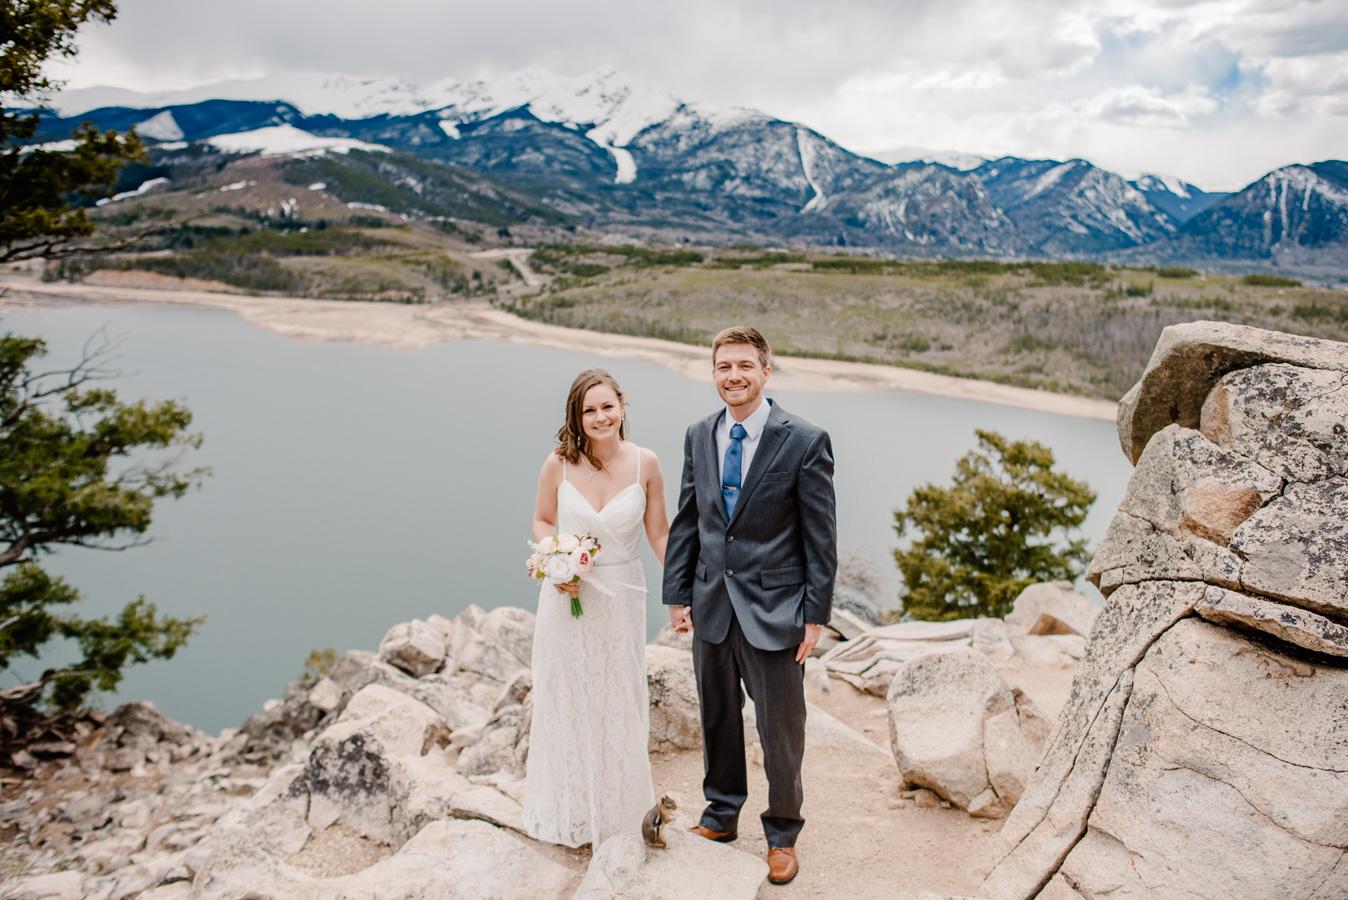 Sapphire Point Breckenridge, Colorado Intimate Elopement Wedding { Aubrey & Gabe | Colorado Mountain Intimate Elopement Photographers}